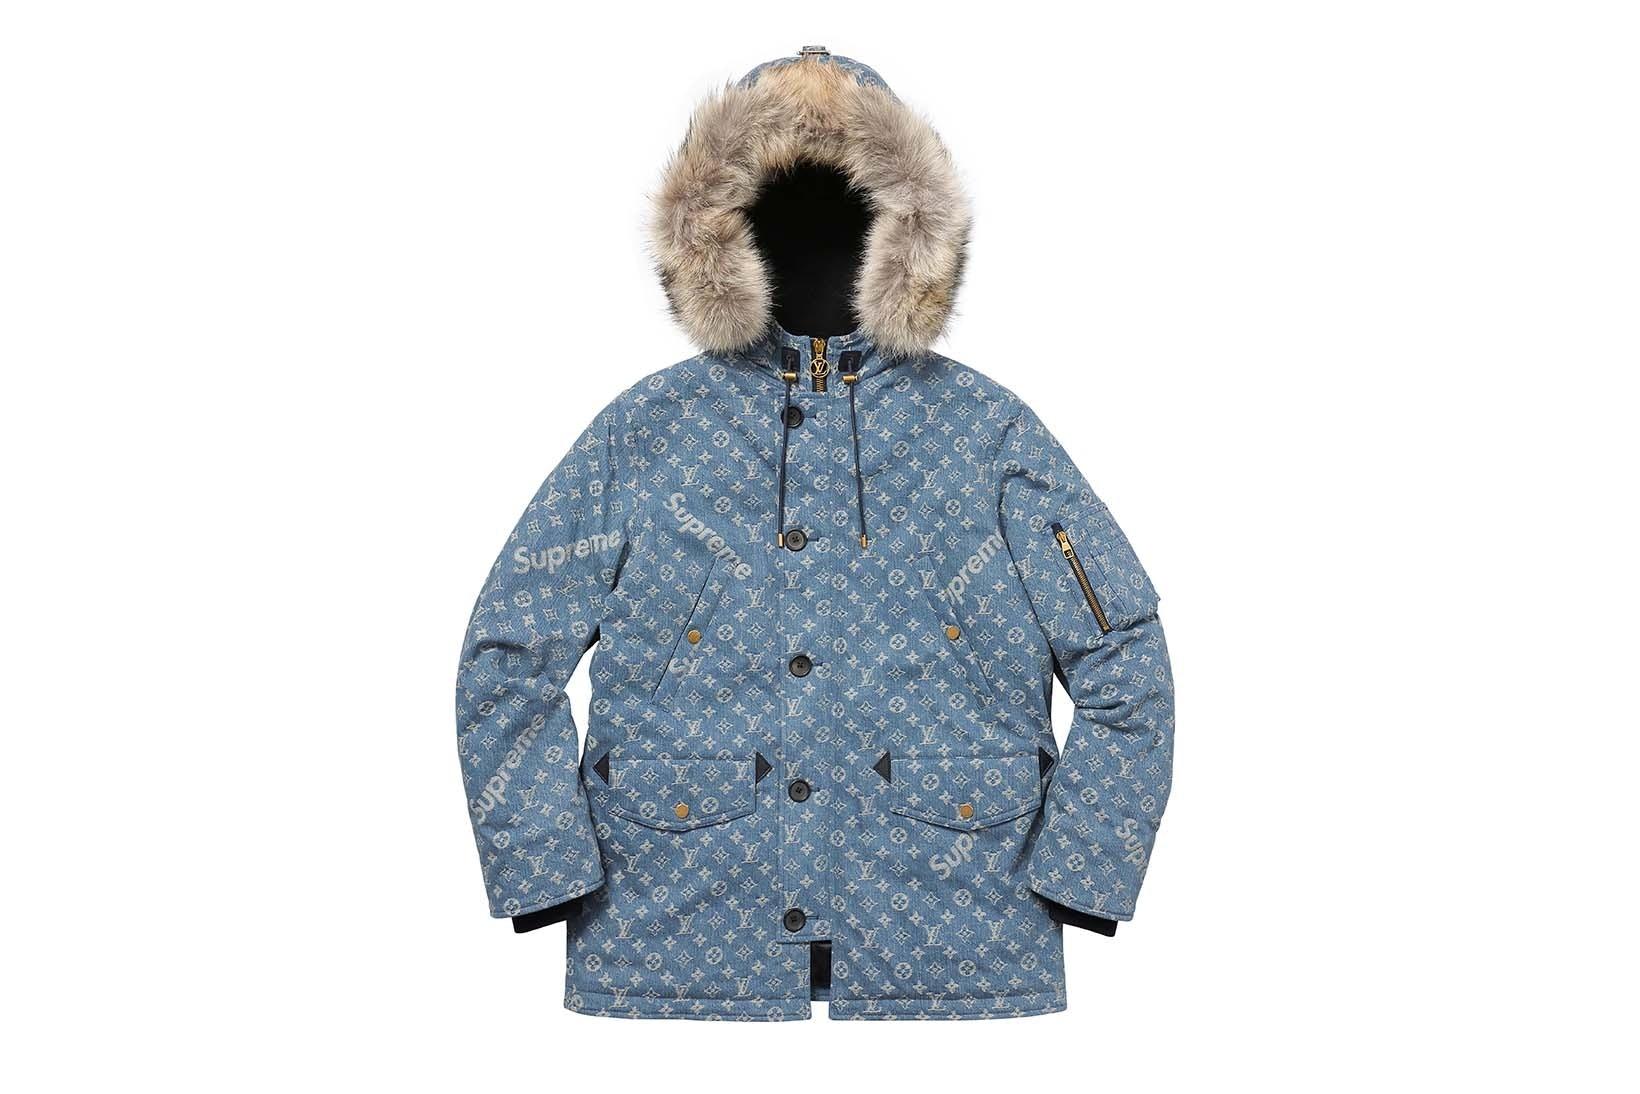 Supreme(シュプリーム)×Louis Vuitton(ルイ・ヴィトン) / ジャカード デニム N-38 パーカー(Jacquard Denim N-3B Parka)